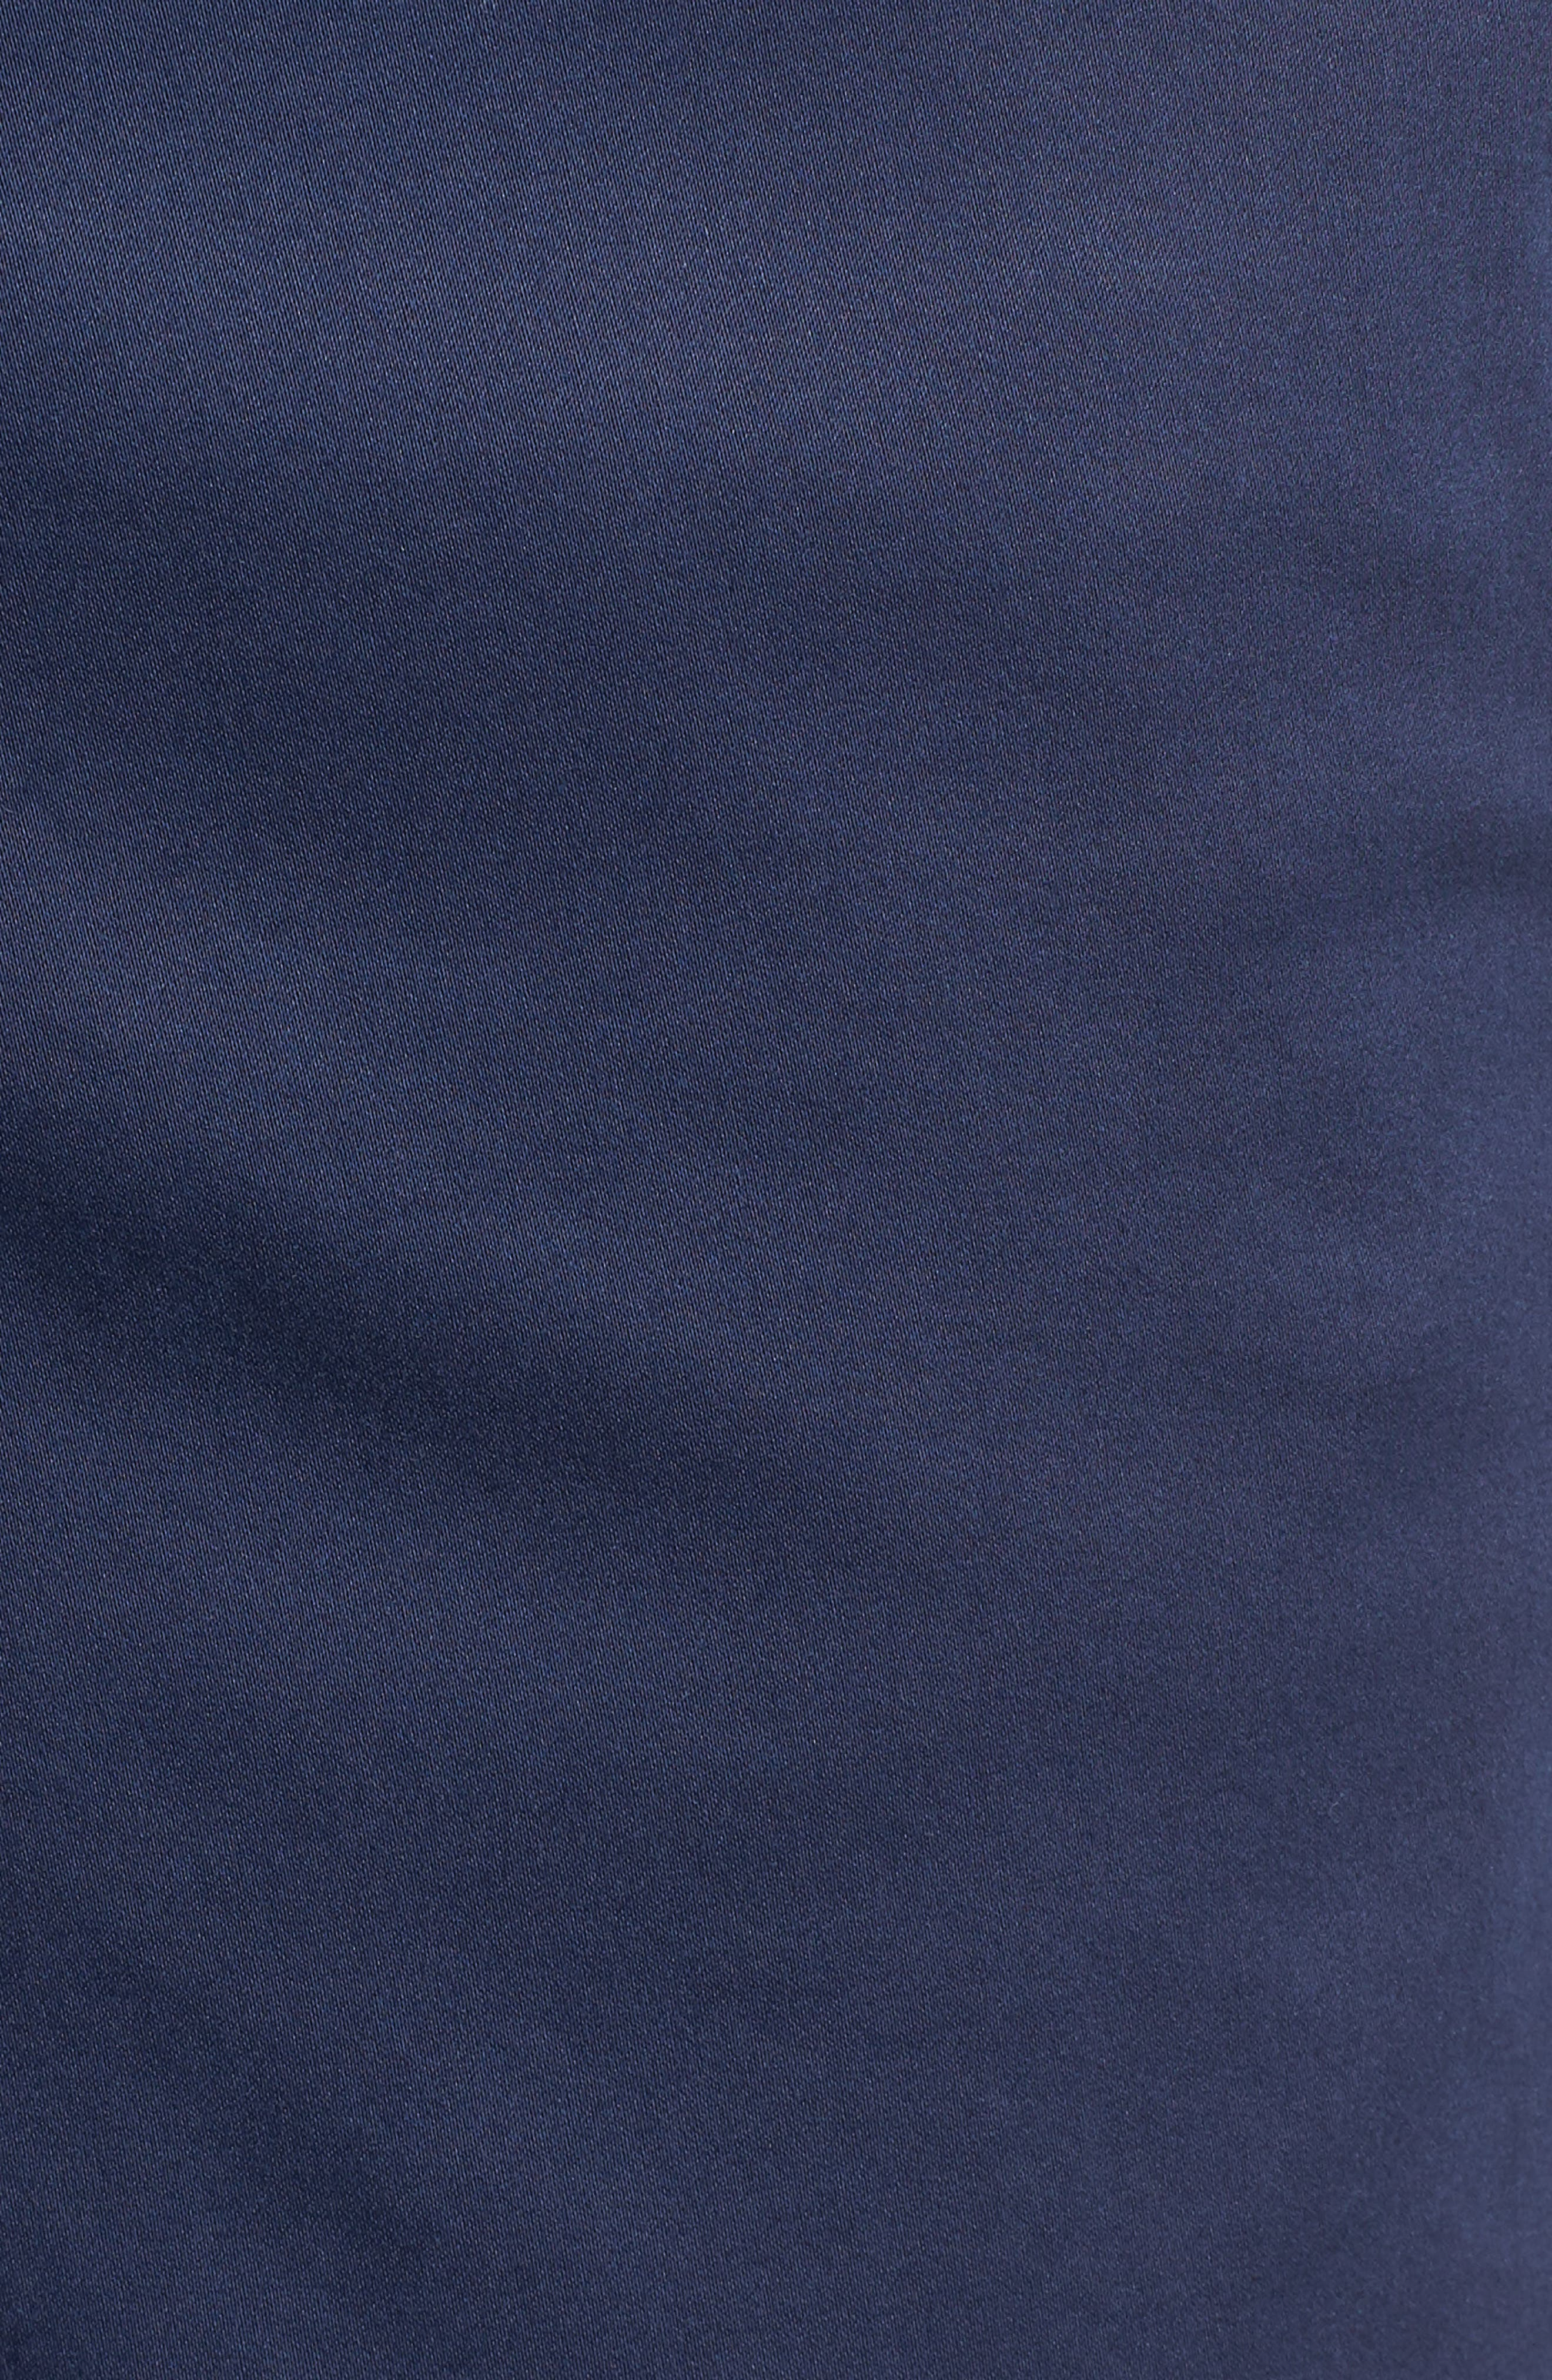 Boracay Chino Shorts,                             Alternate thumbnail 39, color,